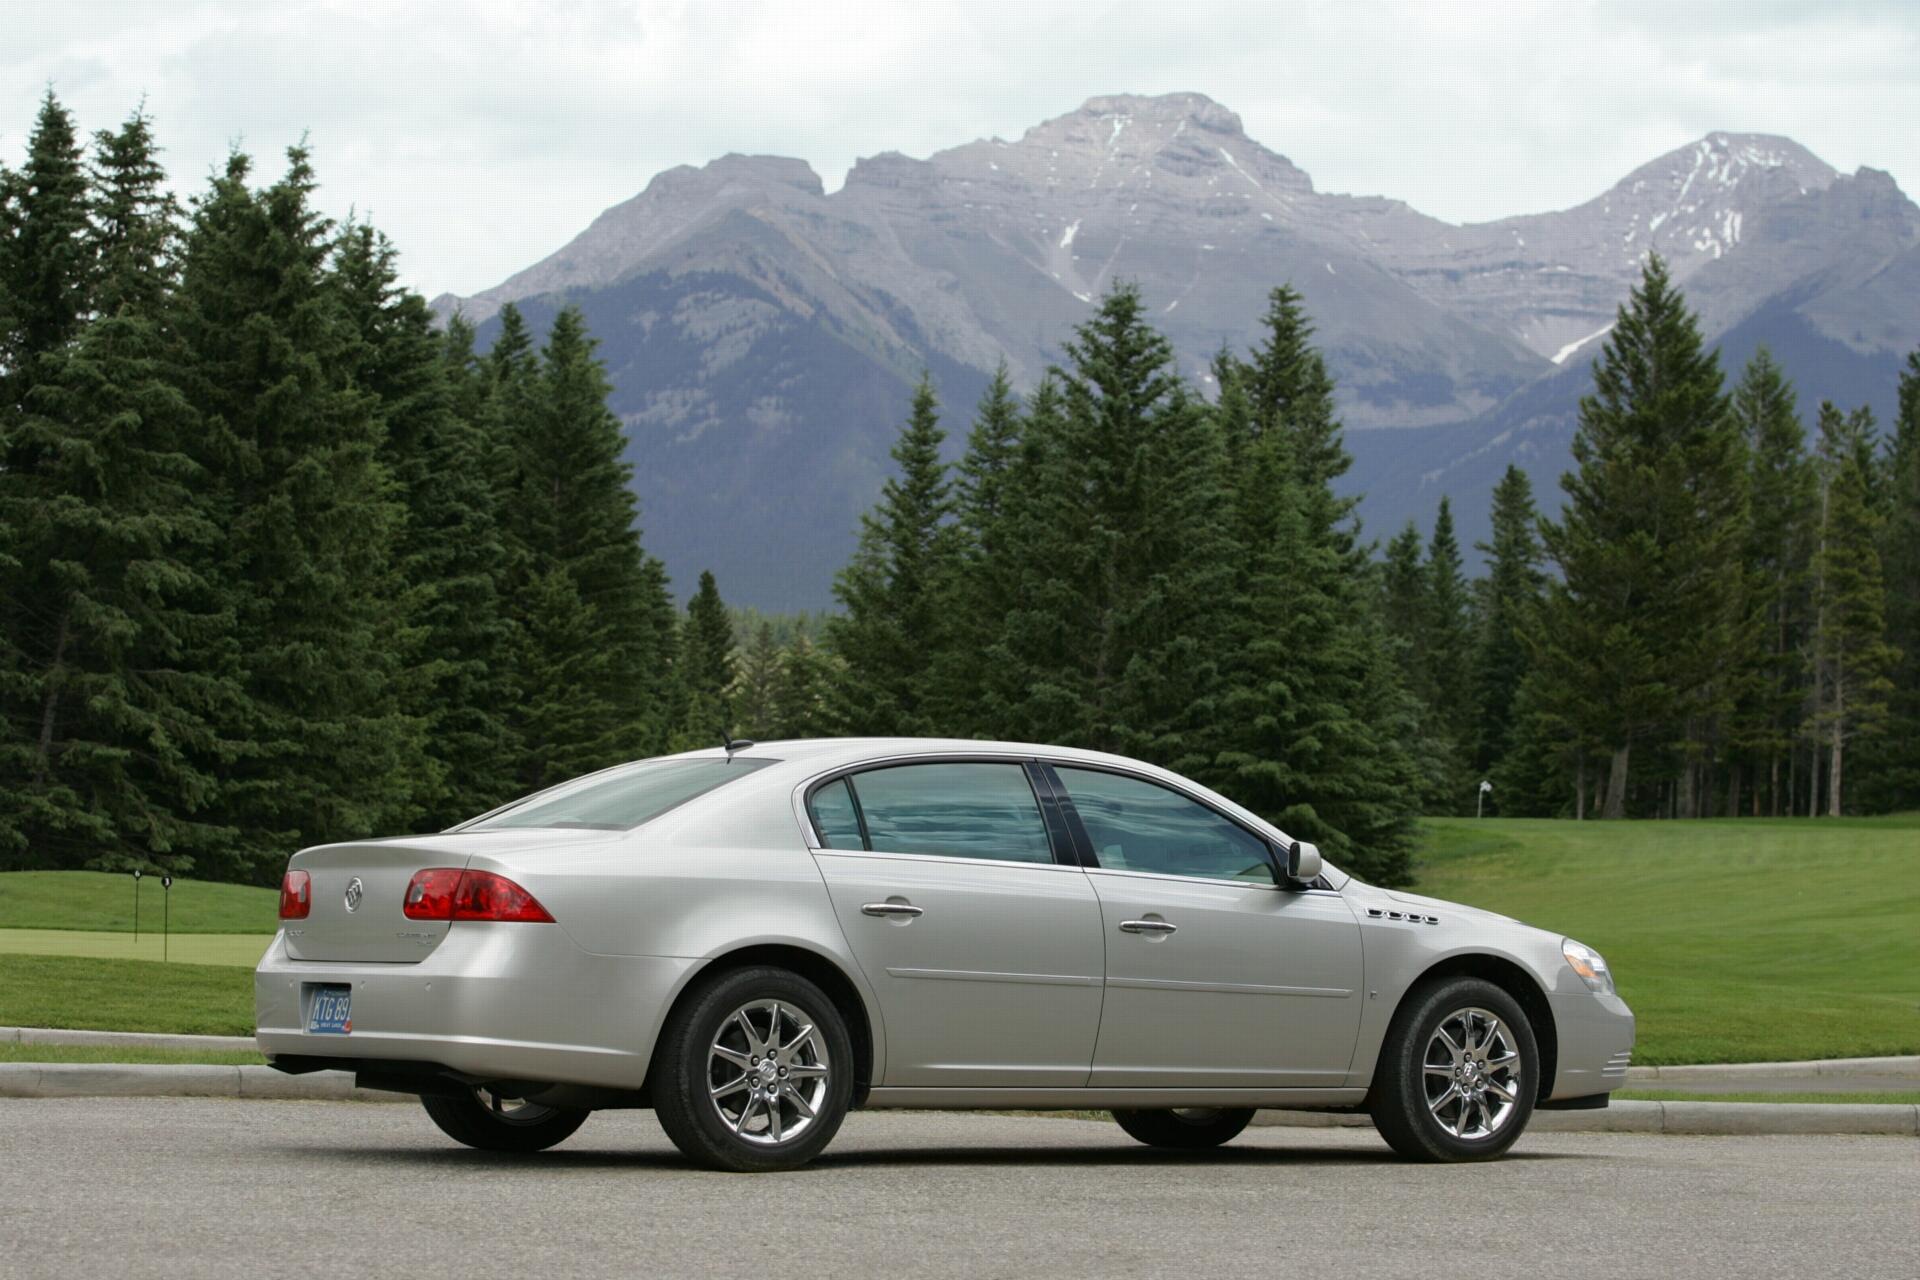 2008 Buick Lucerne - conceptcarz.com